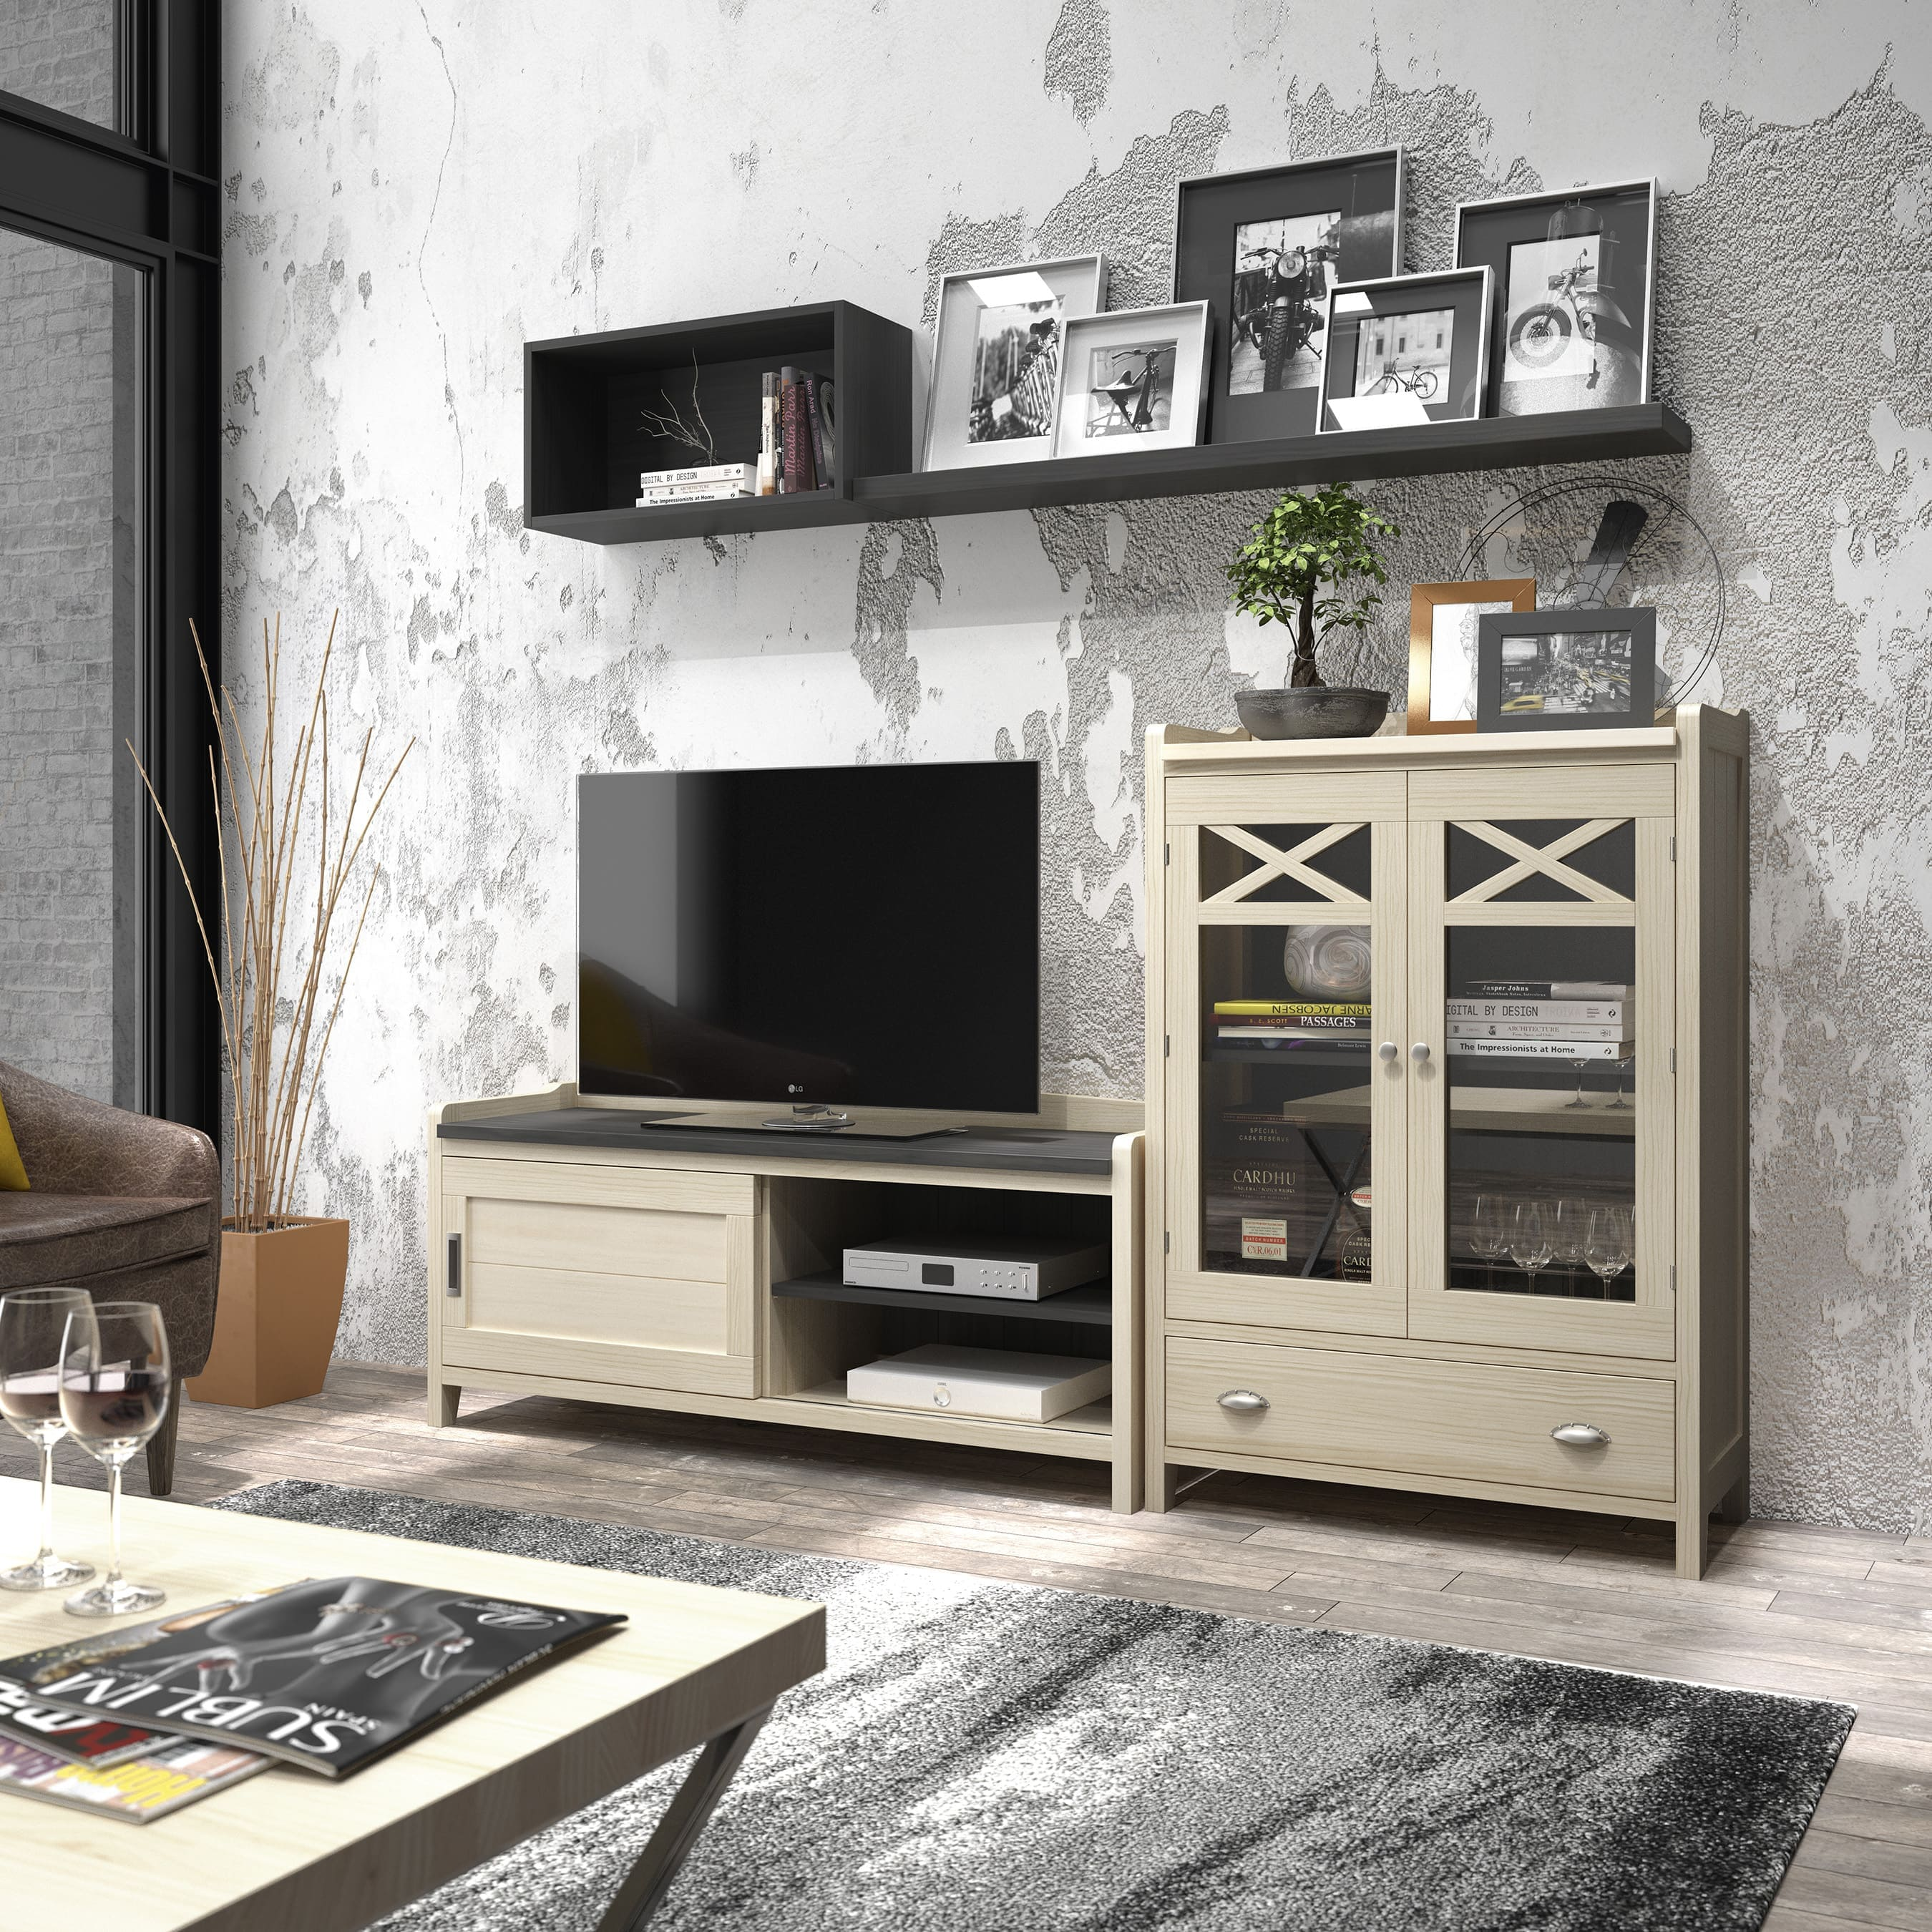 salon-contemporaneo-muebles-paco-caballero-1337-5c98b367110af